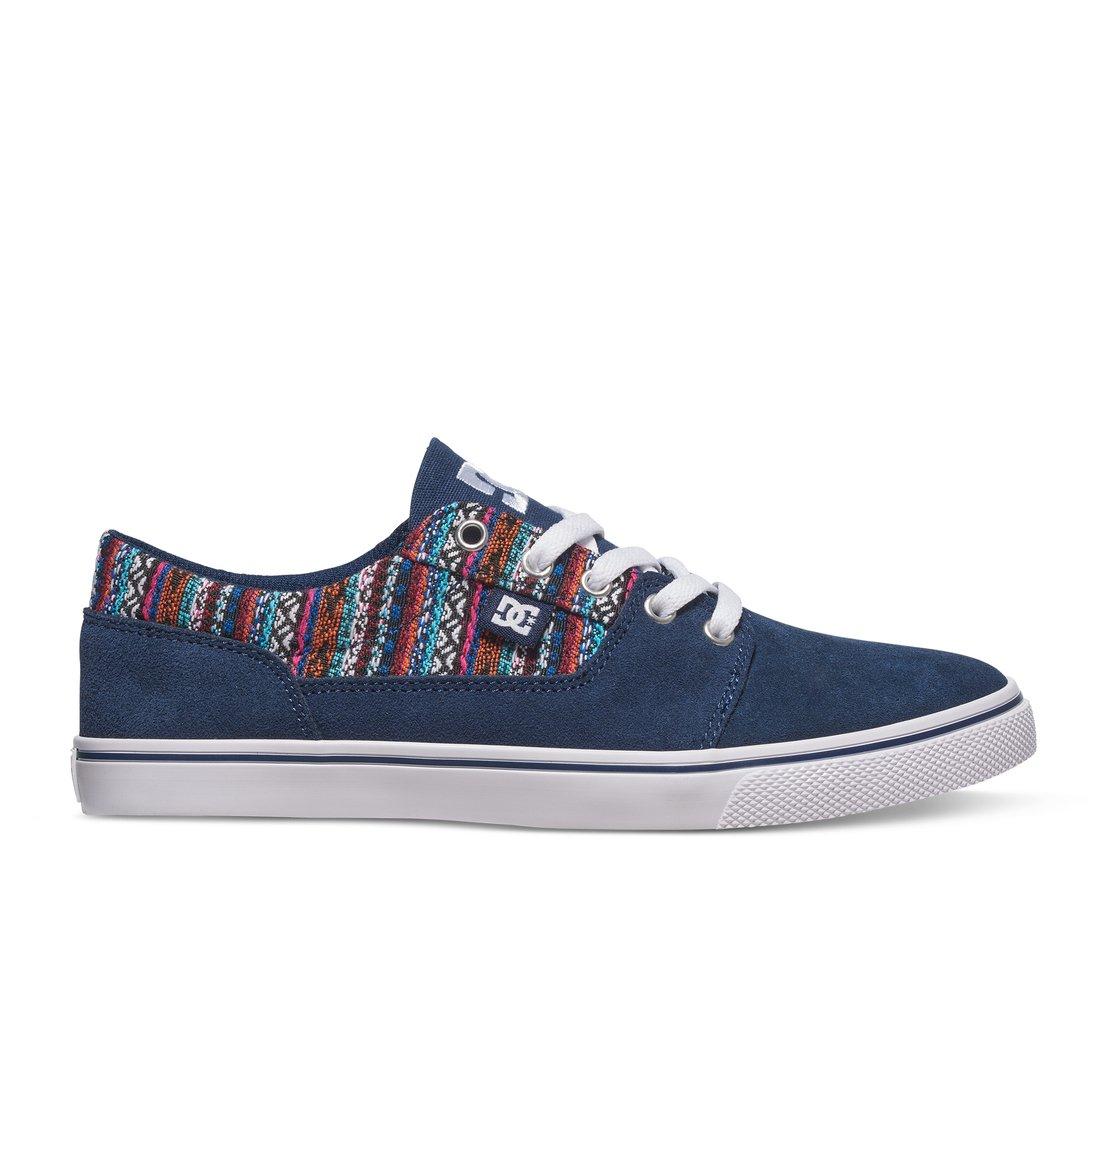 fb9834890 sneakers von dc shoes